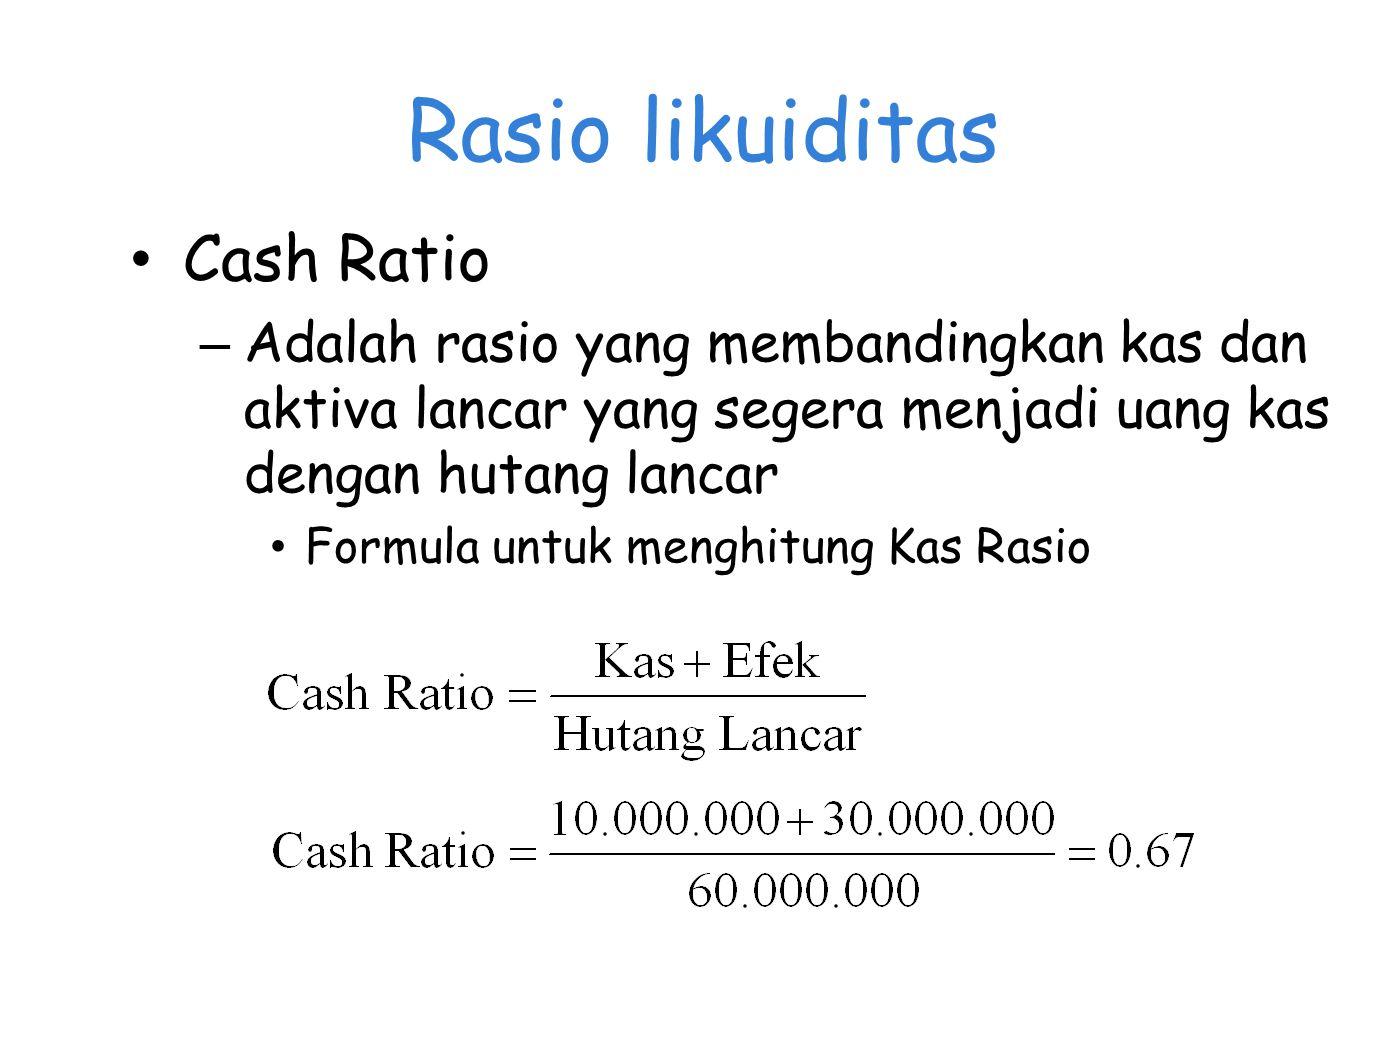 Rasio likuiditas Cash Ratio